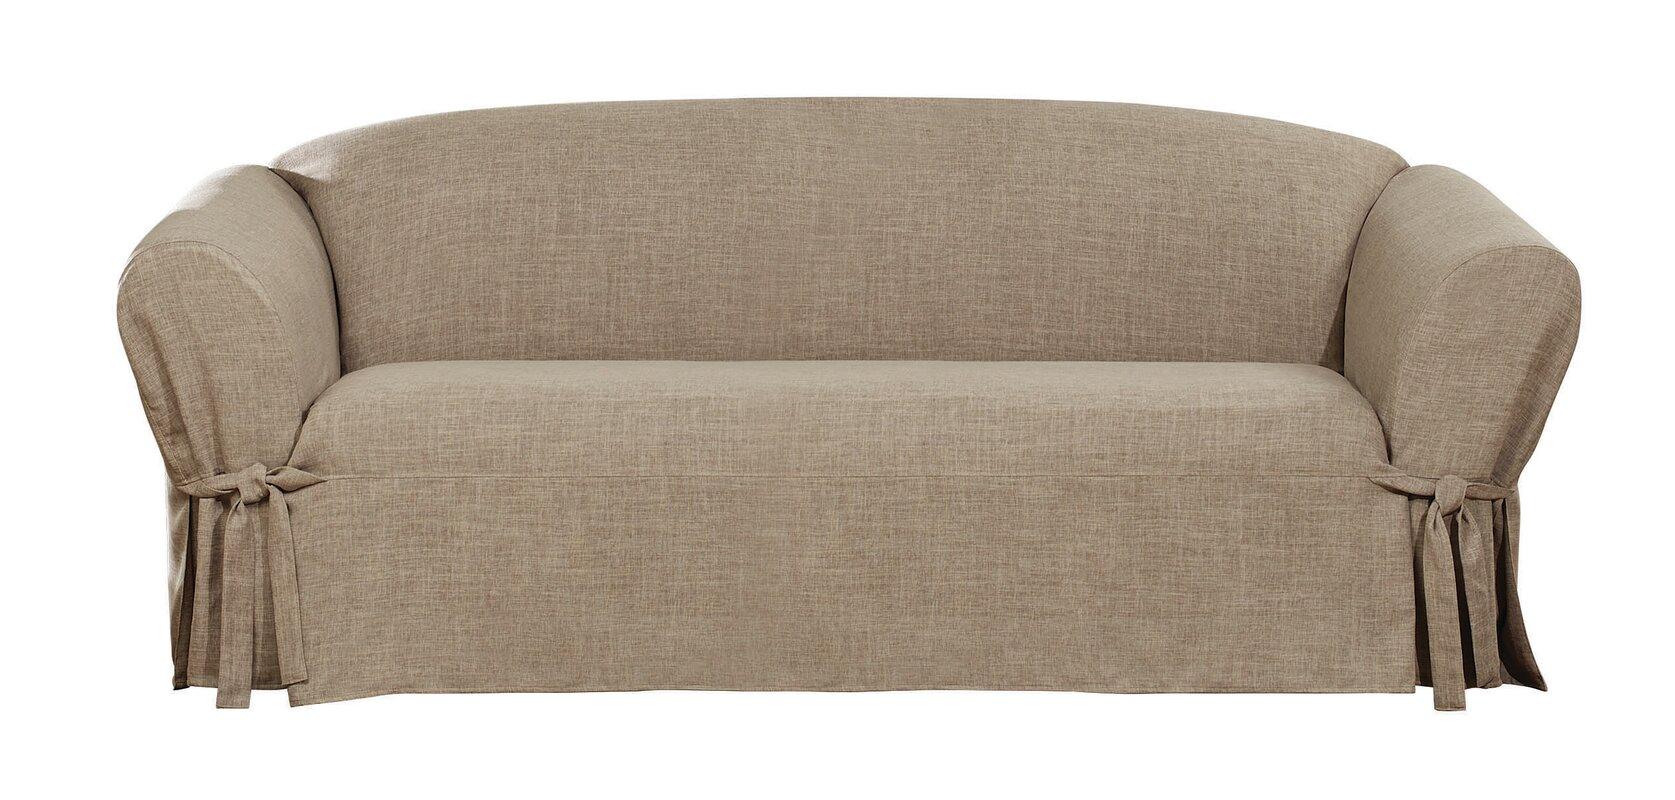 Textured Linen Box Cushion Sofa Slipcover